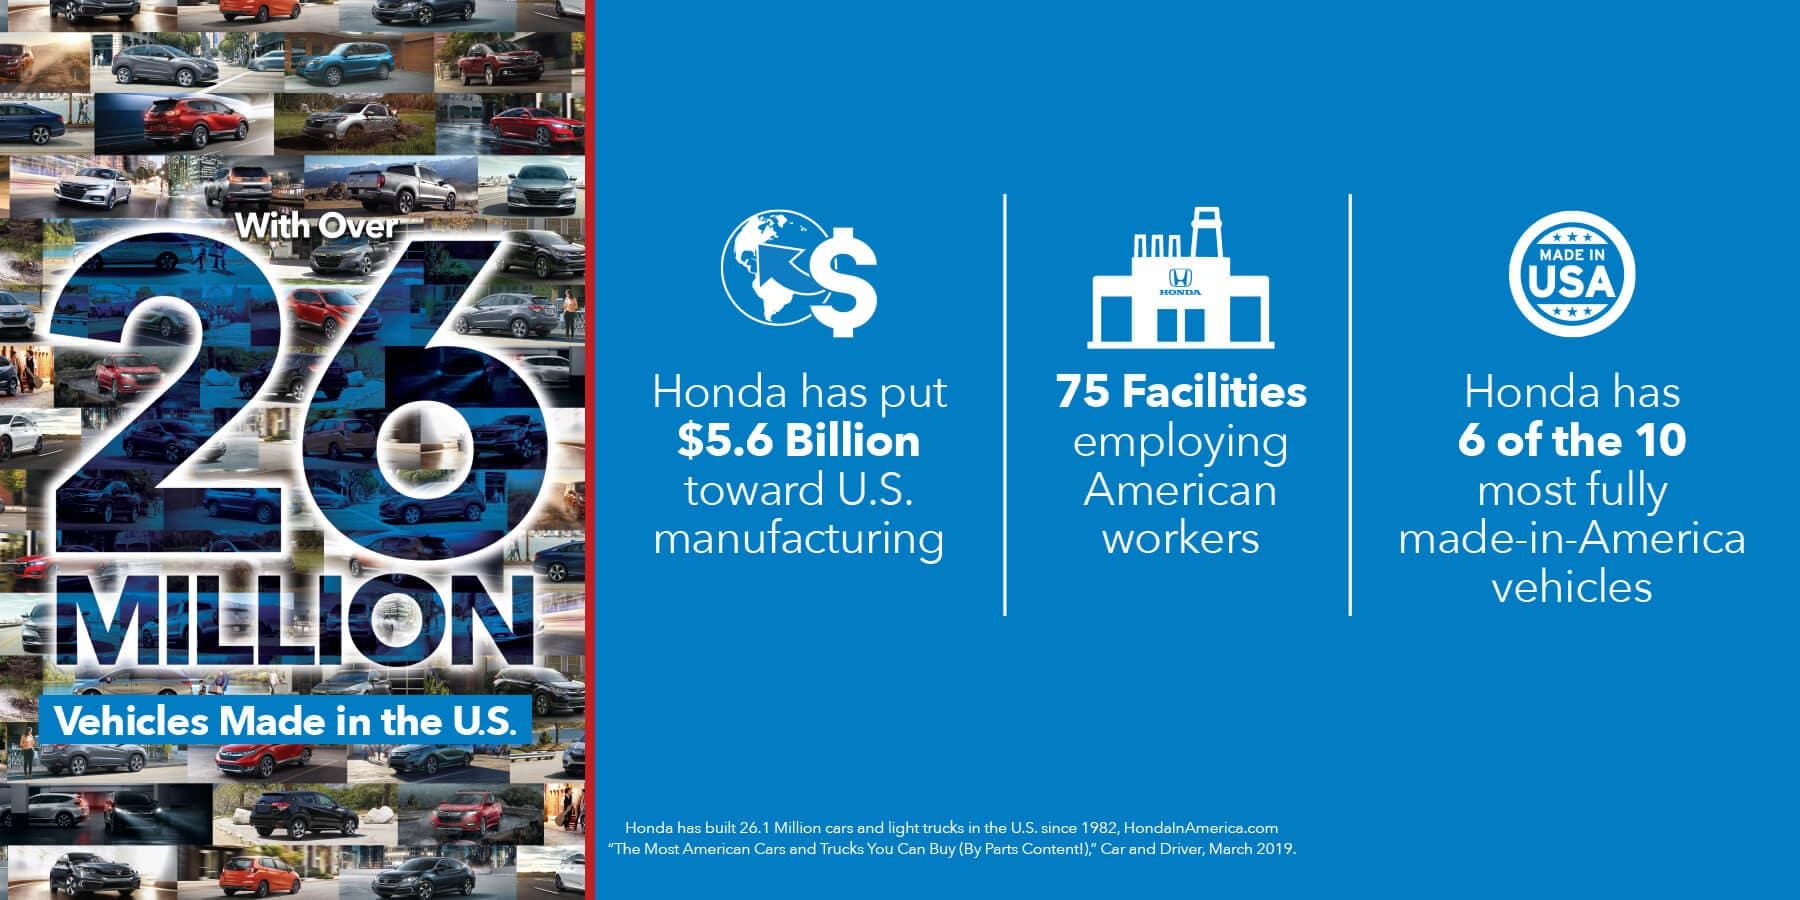 Detroit Area Honda Dealers Made in America HP Slide